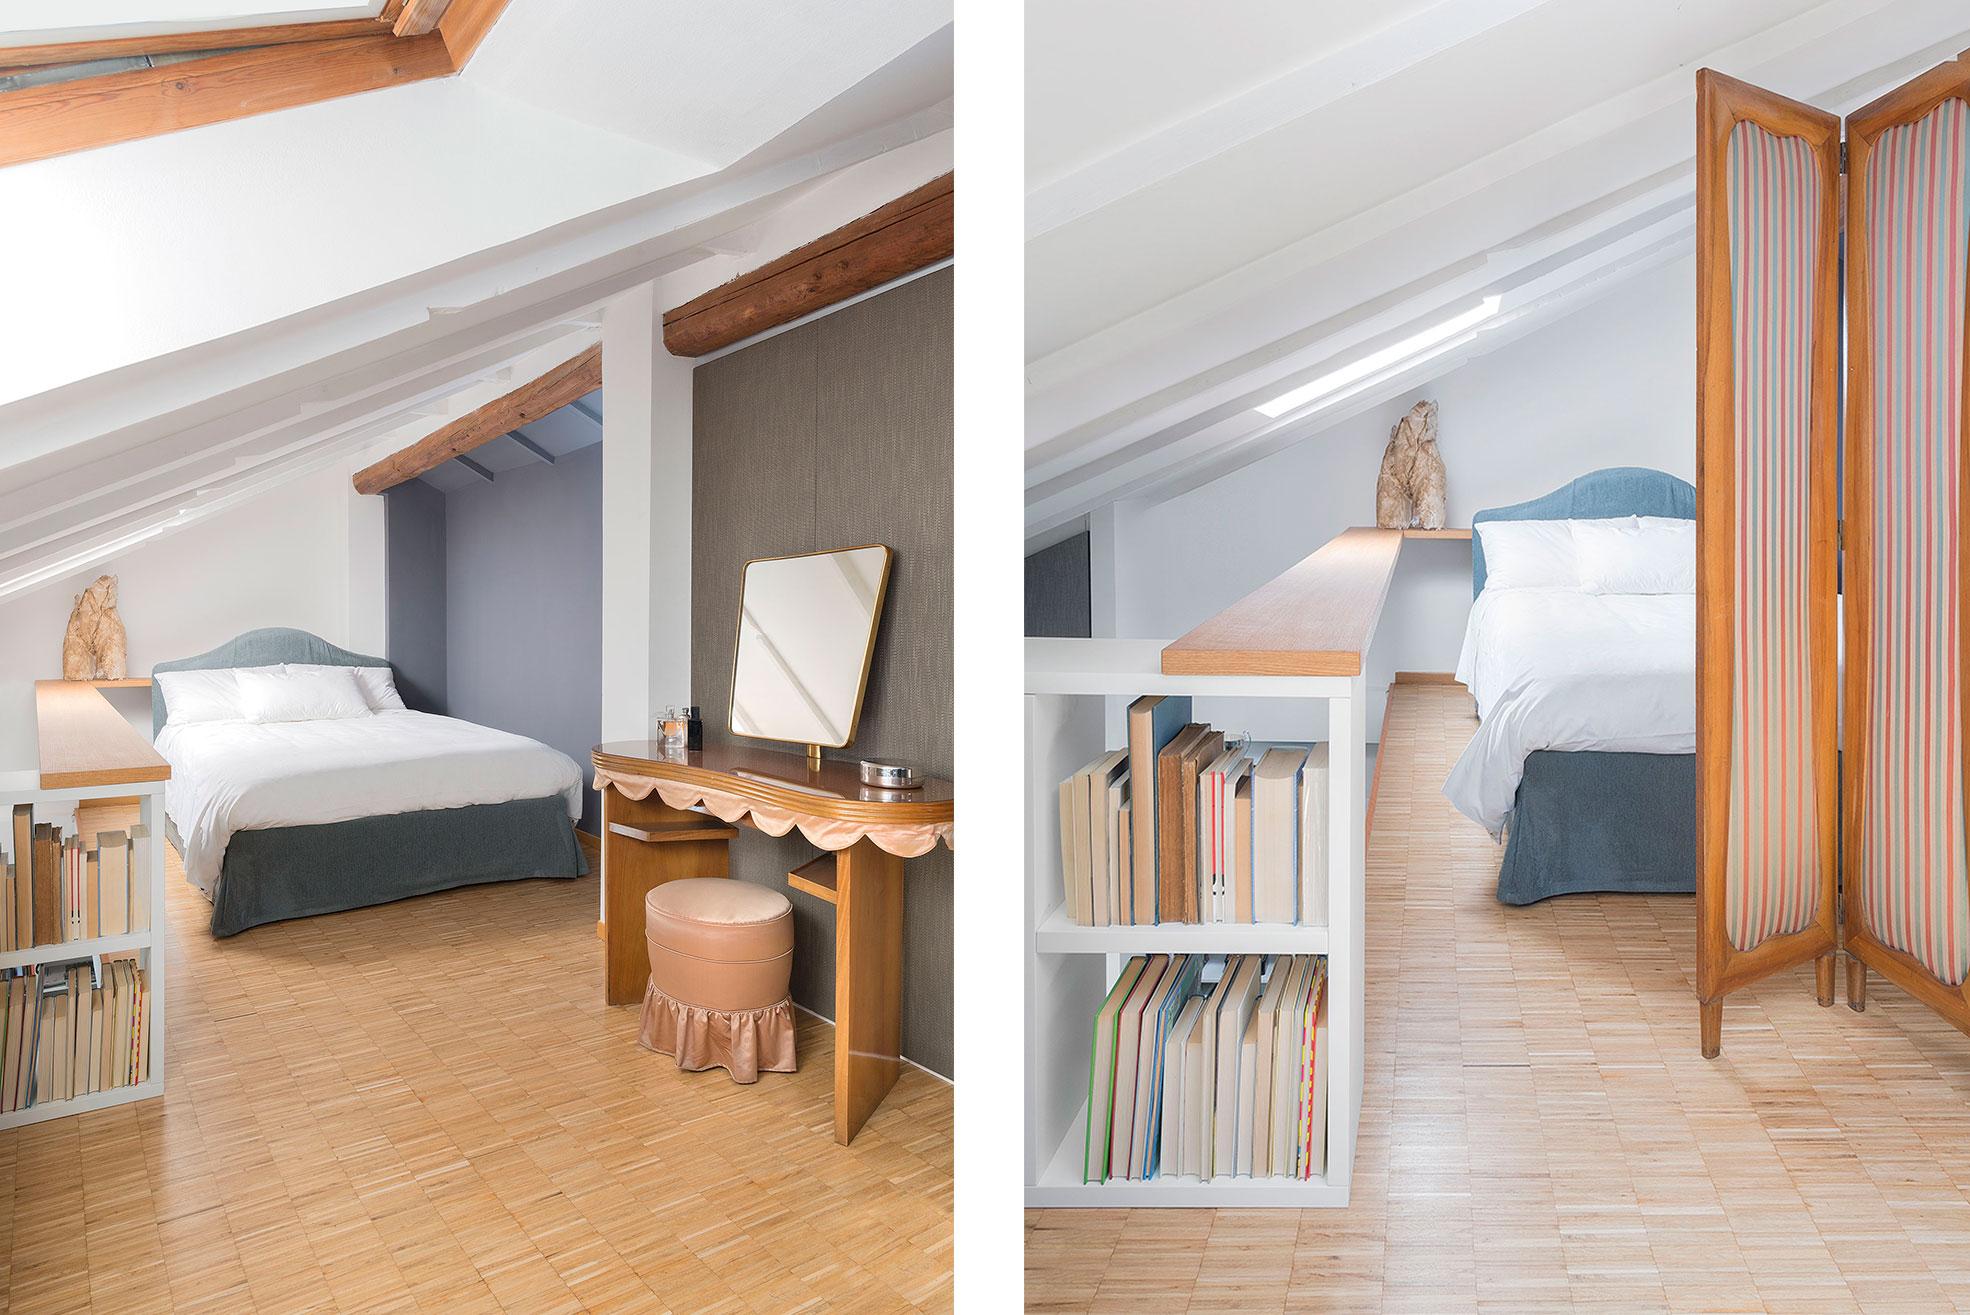 Bedroom of Federica Fracassi's Home Photographer Maria Teresa Furnari